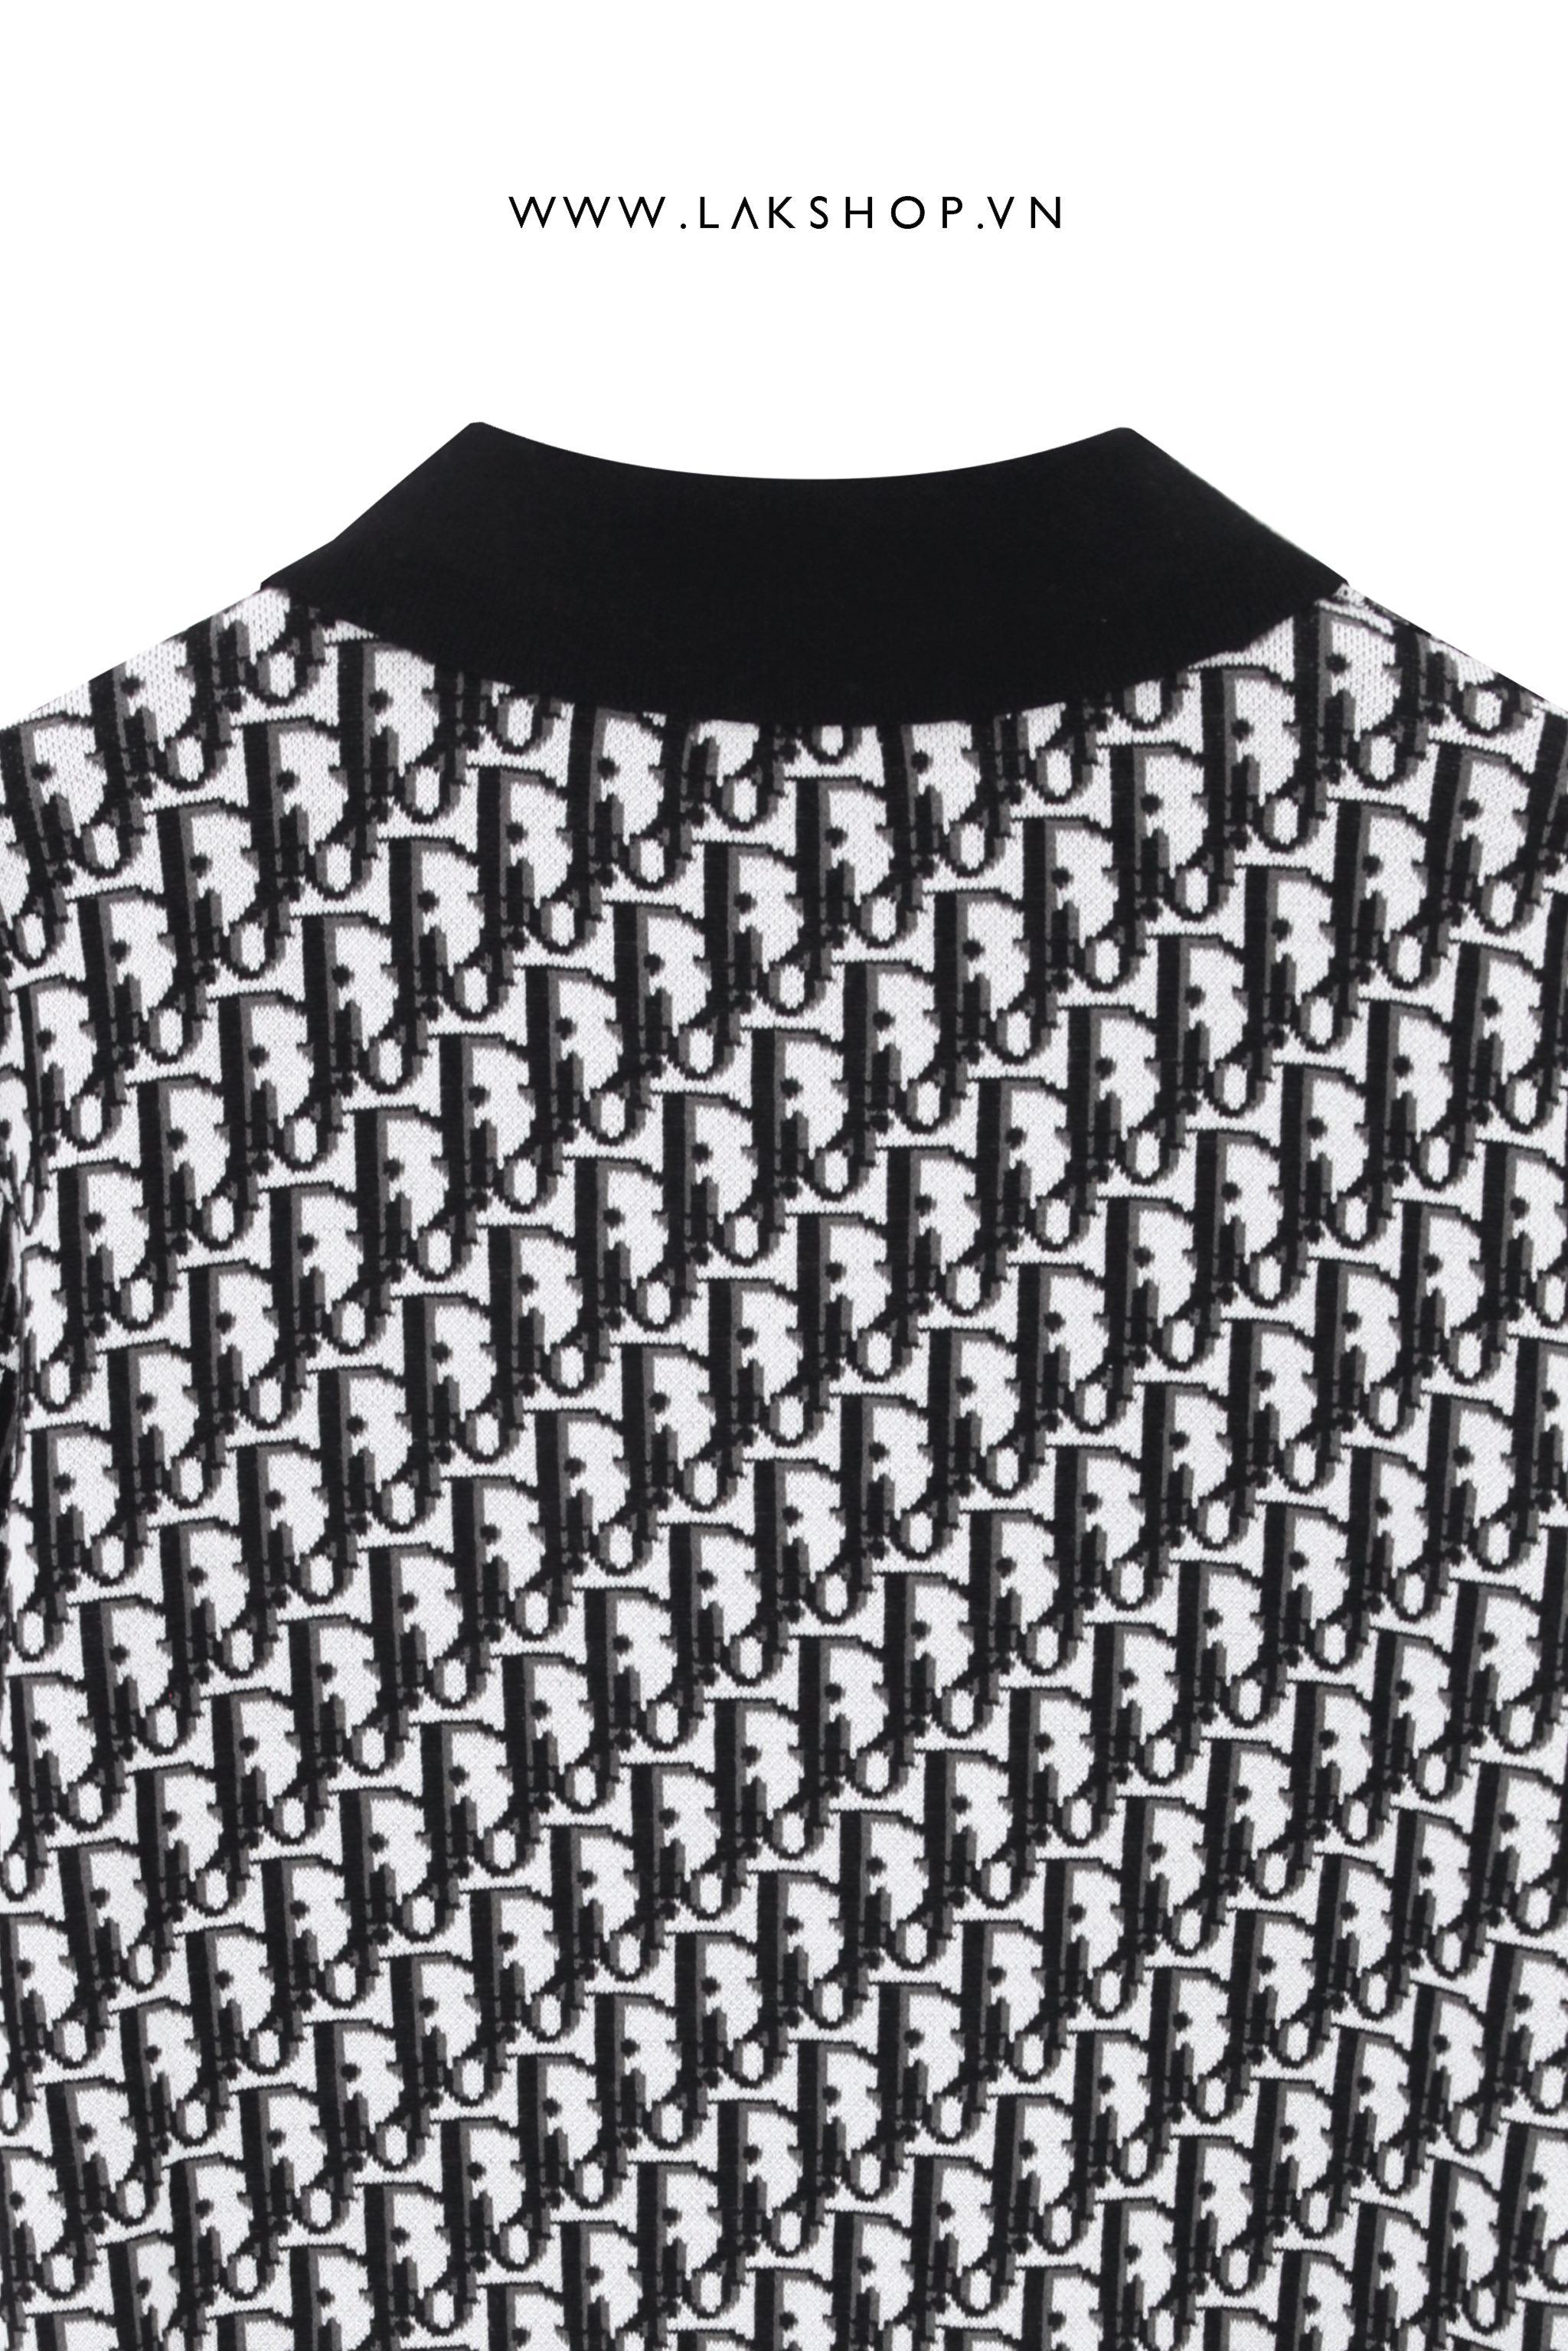 Balenciaga Embroidered Logo Black T-shirt